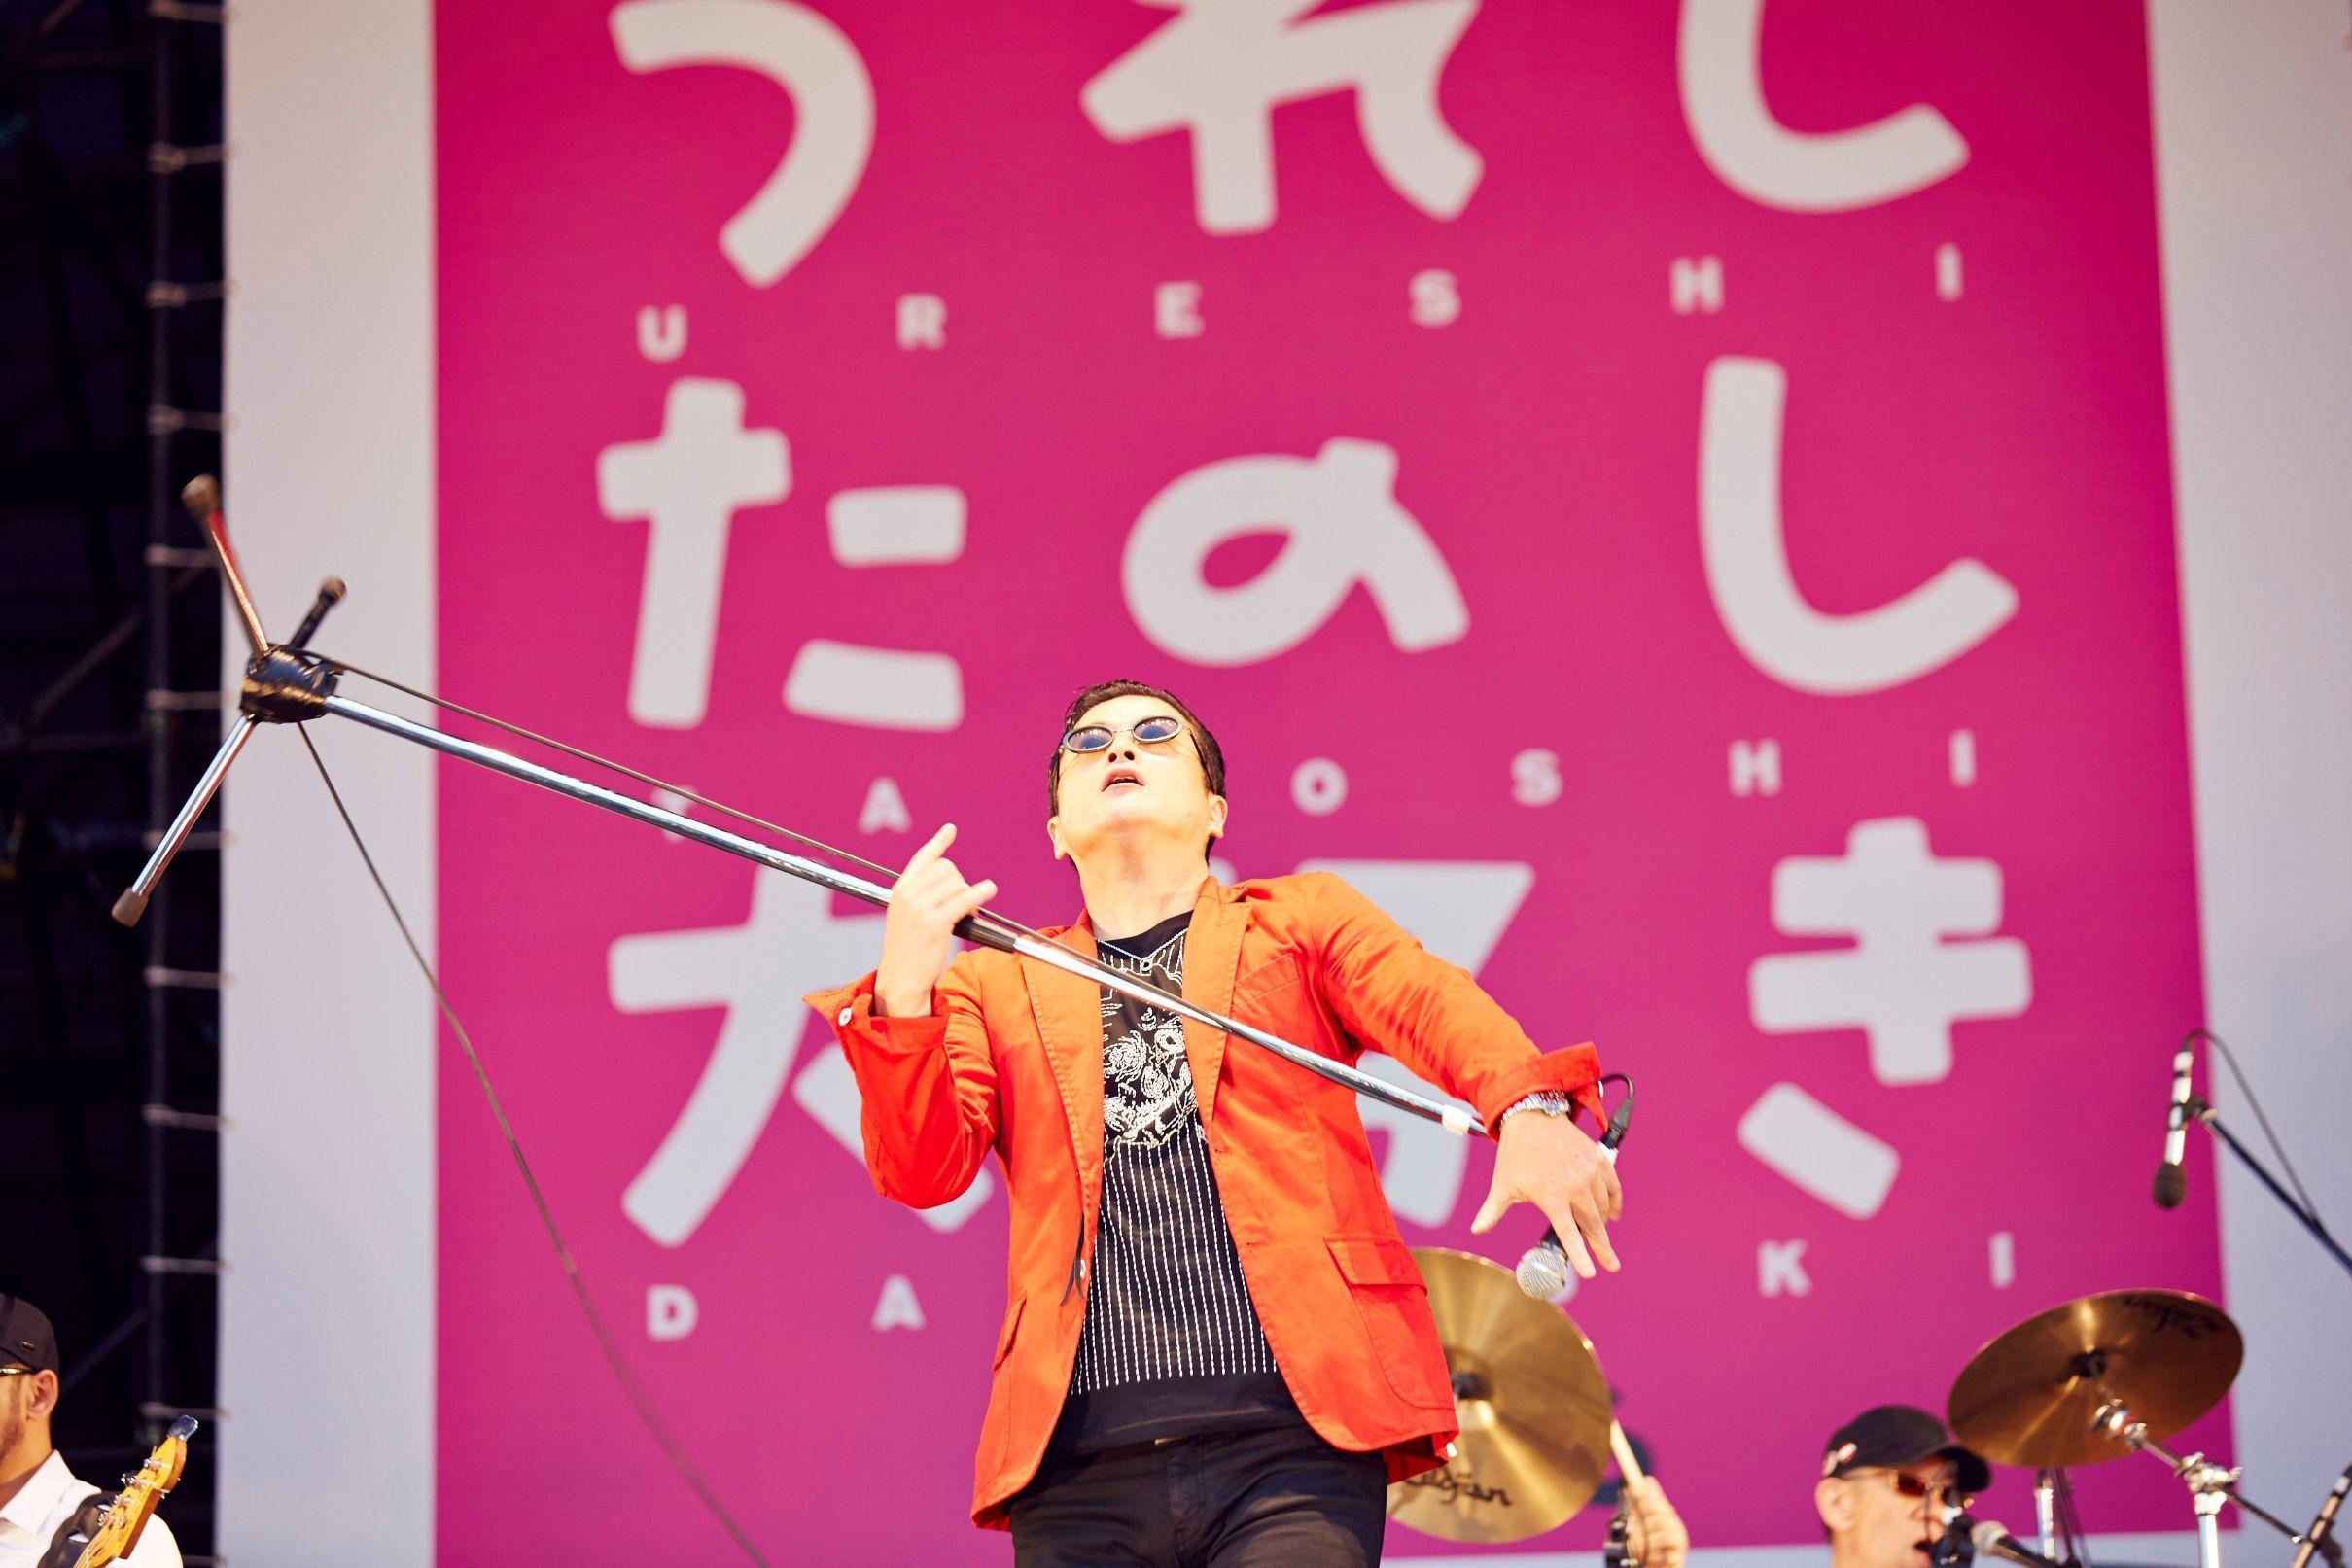 TH eROCKERS Photo:植松千波 / 橋本塁(SOUND SHOOTER)